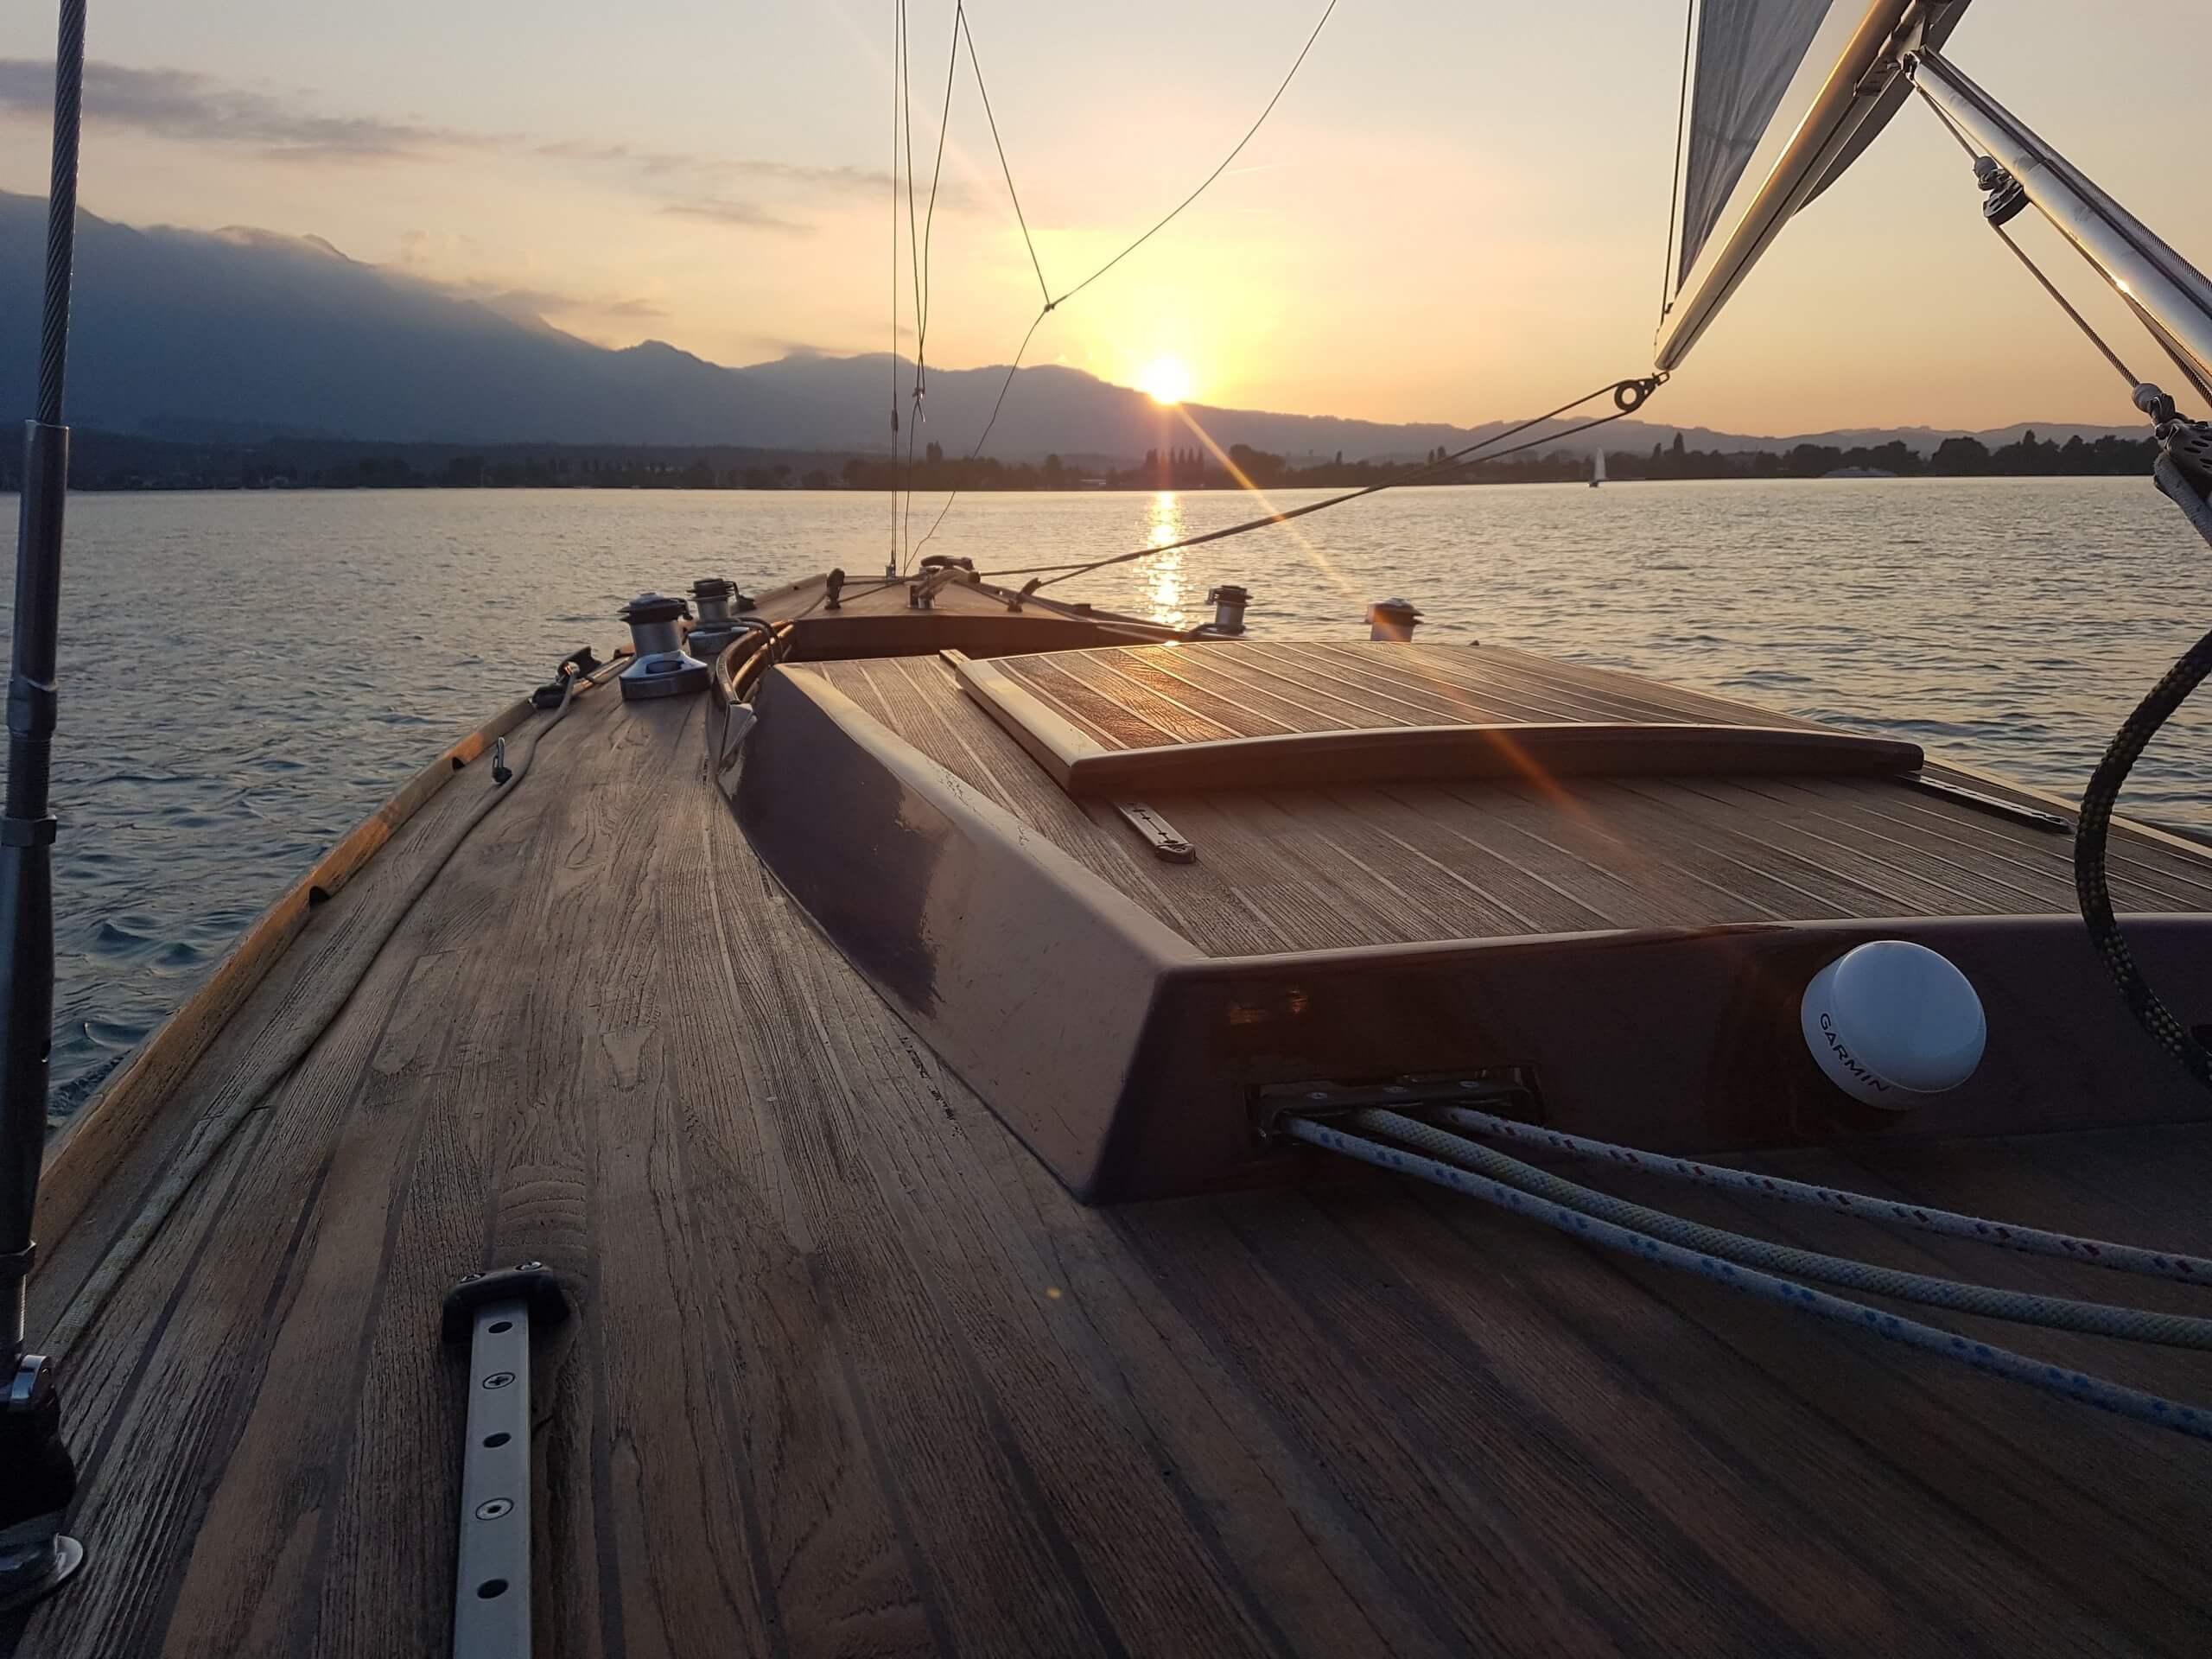 spiez-segelschule-donnerstag-abend-thunersee-segeln-sommer-sonnenuntergang